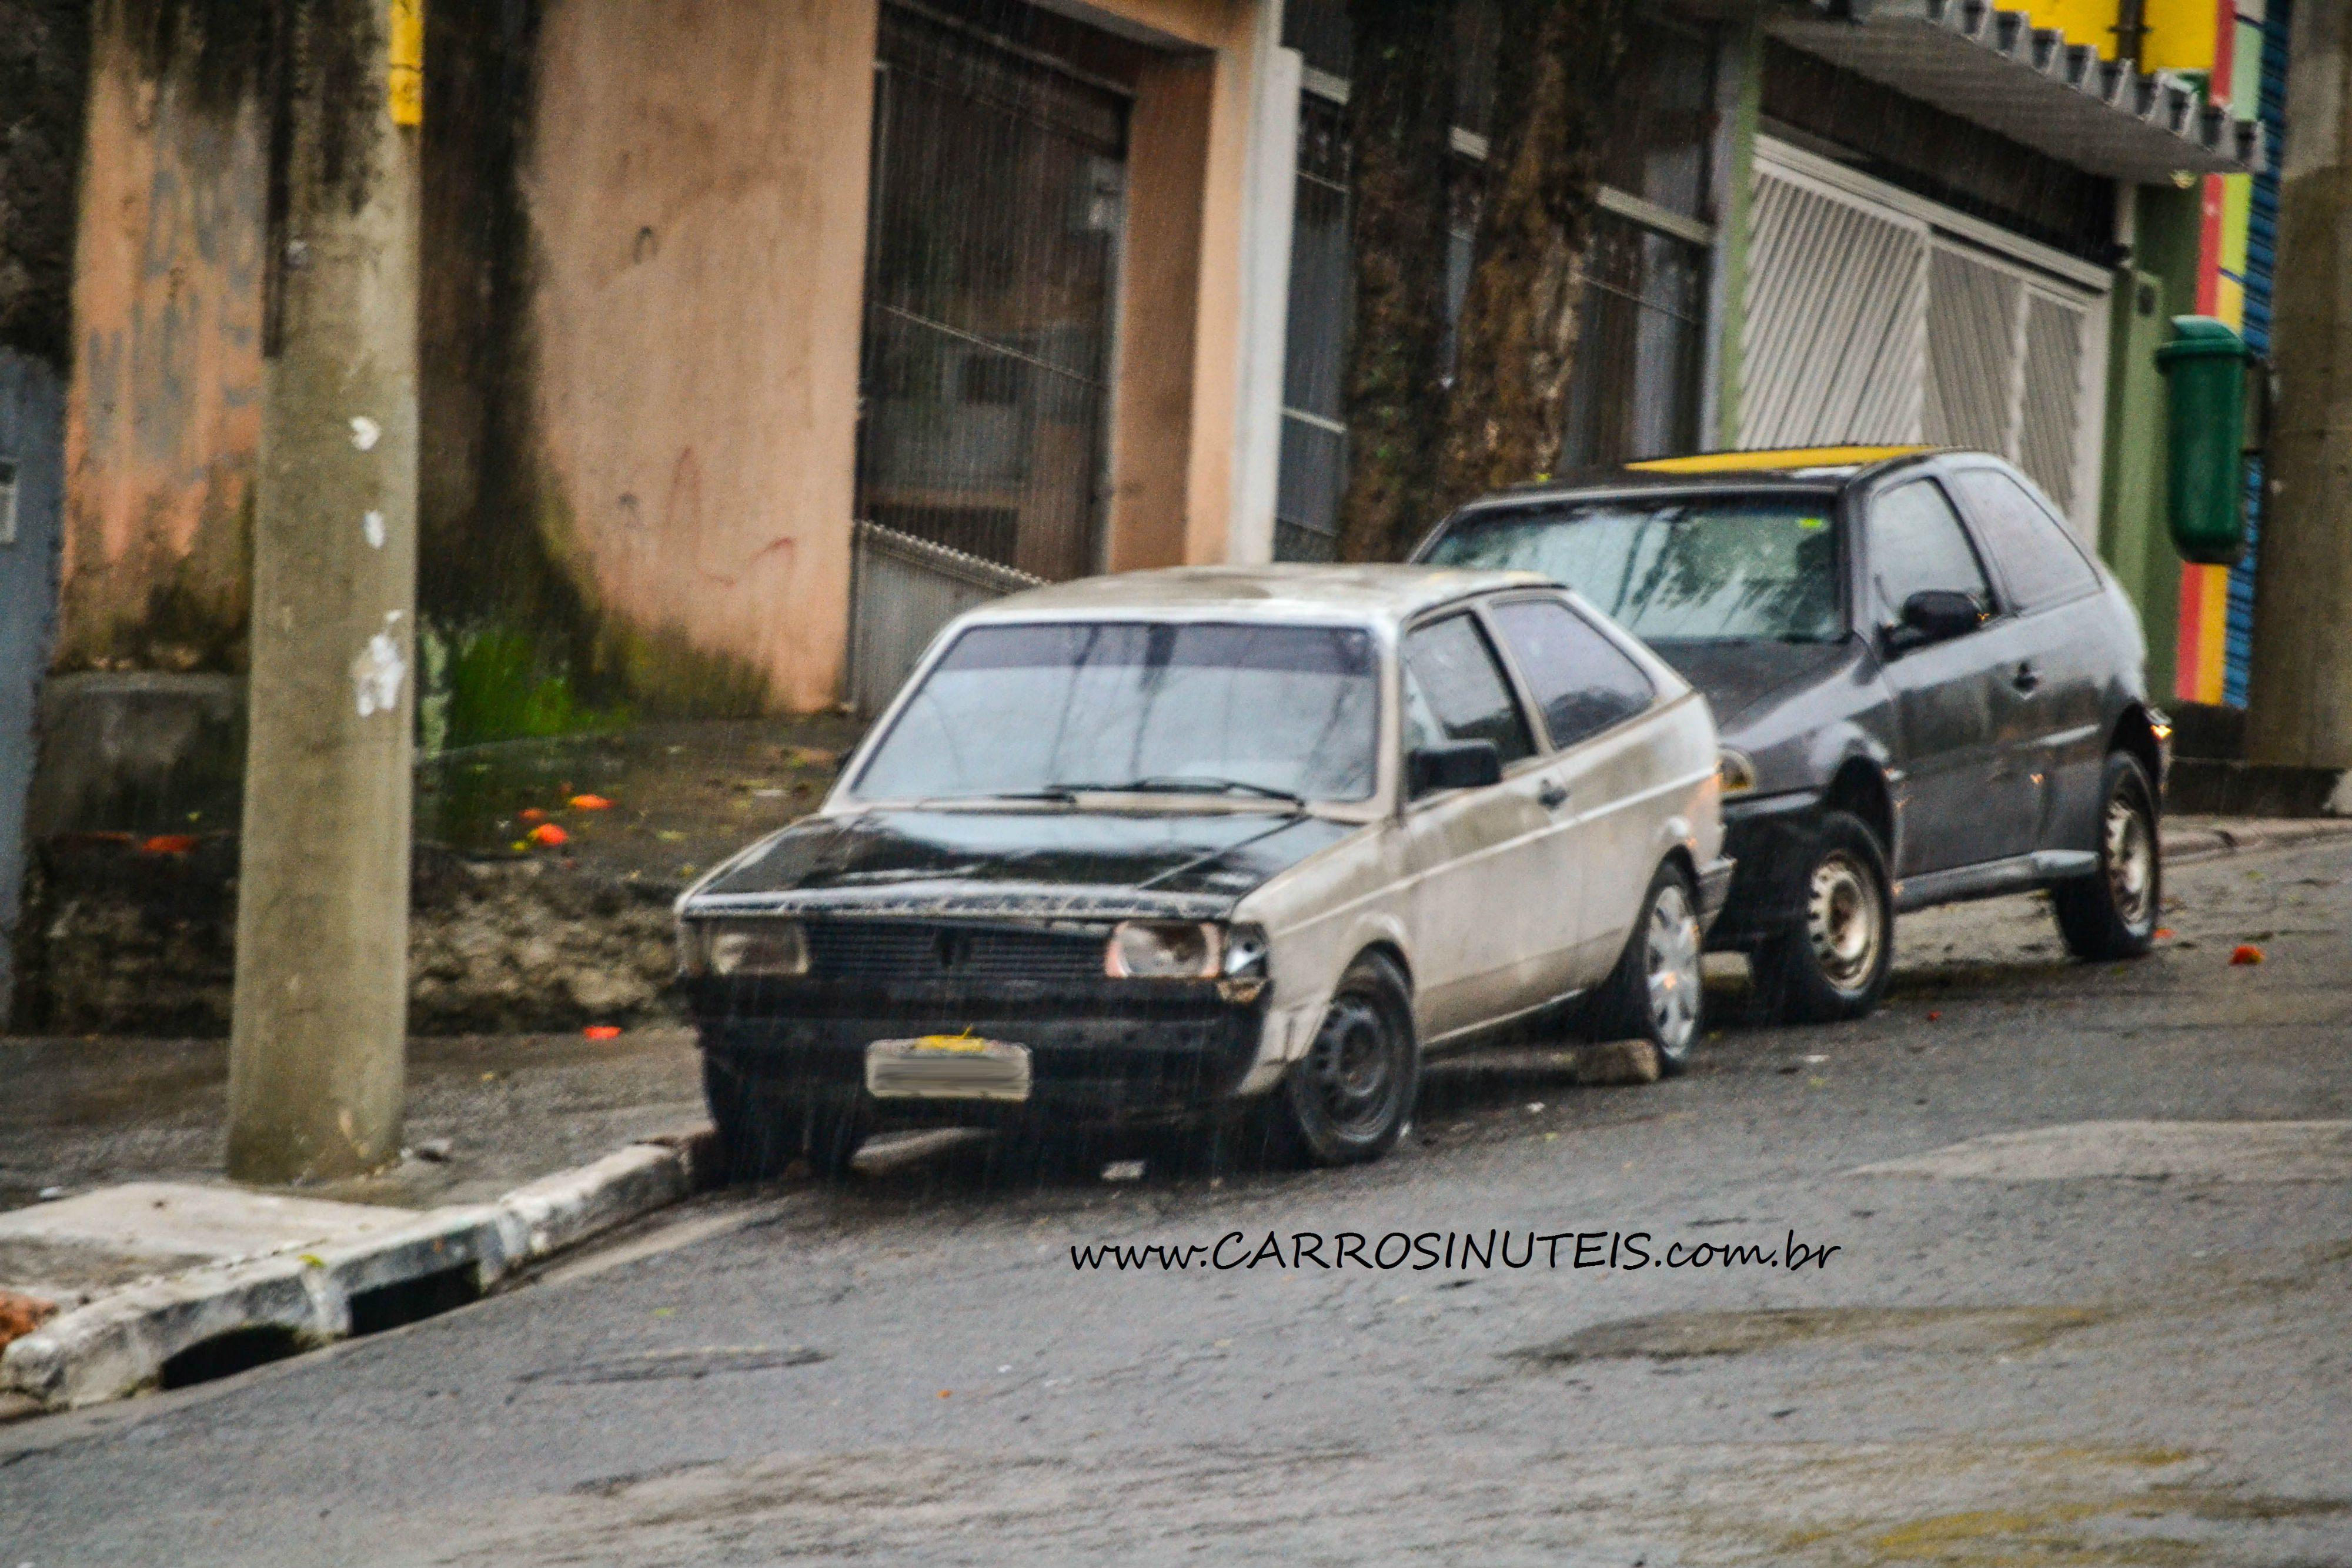 Kioma-SaoPaulo-VW-Gol VW Gol, São Paulo, SP. Foto de Kioma.